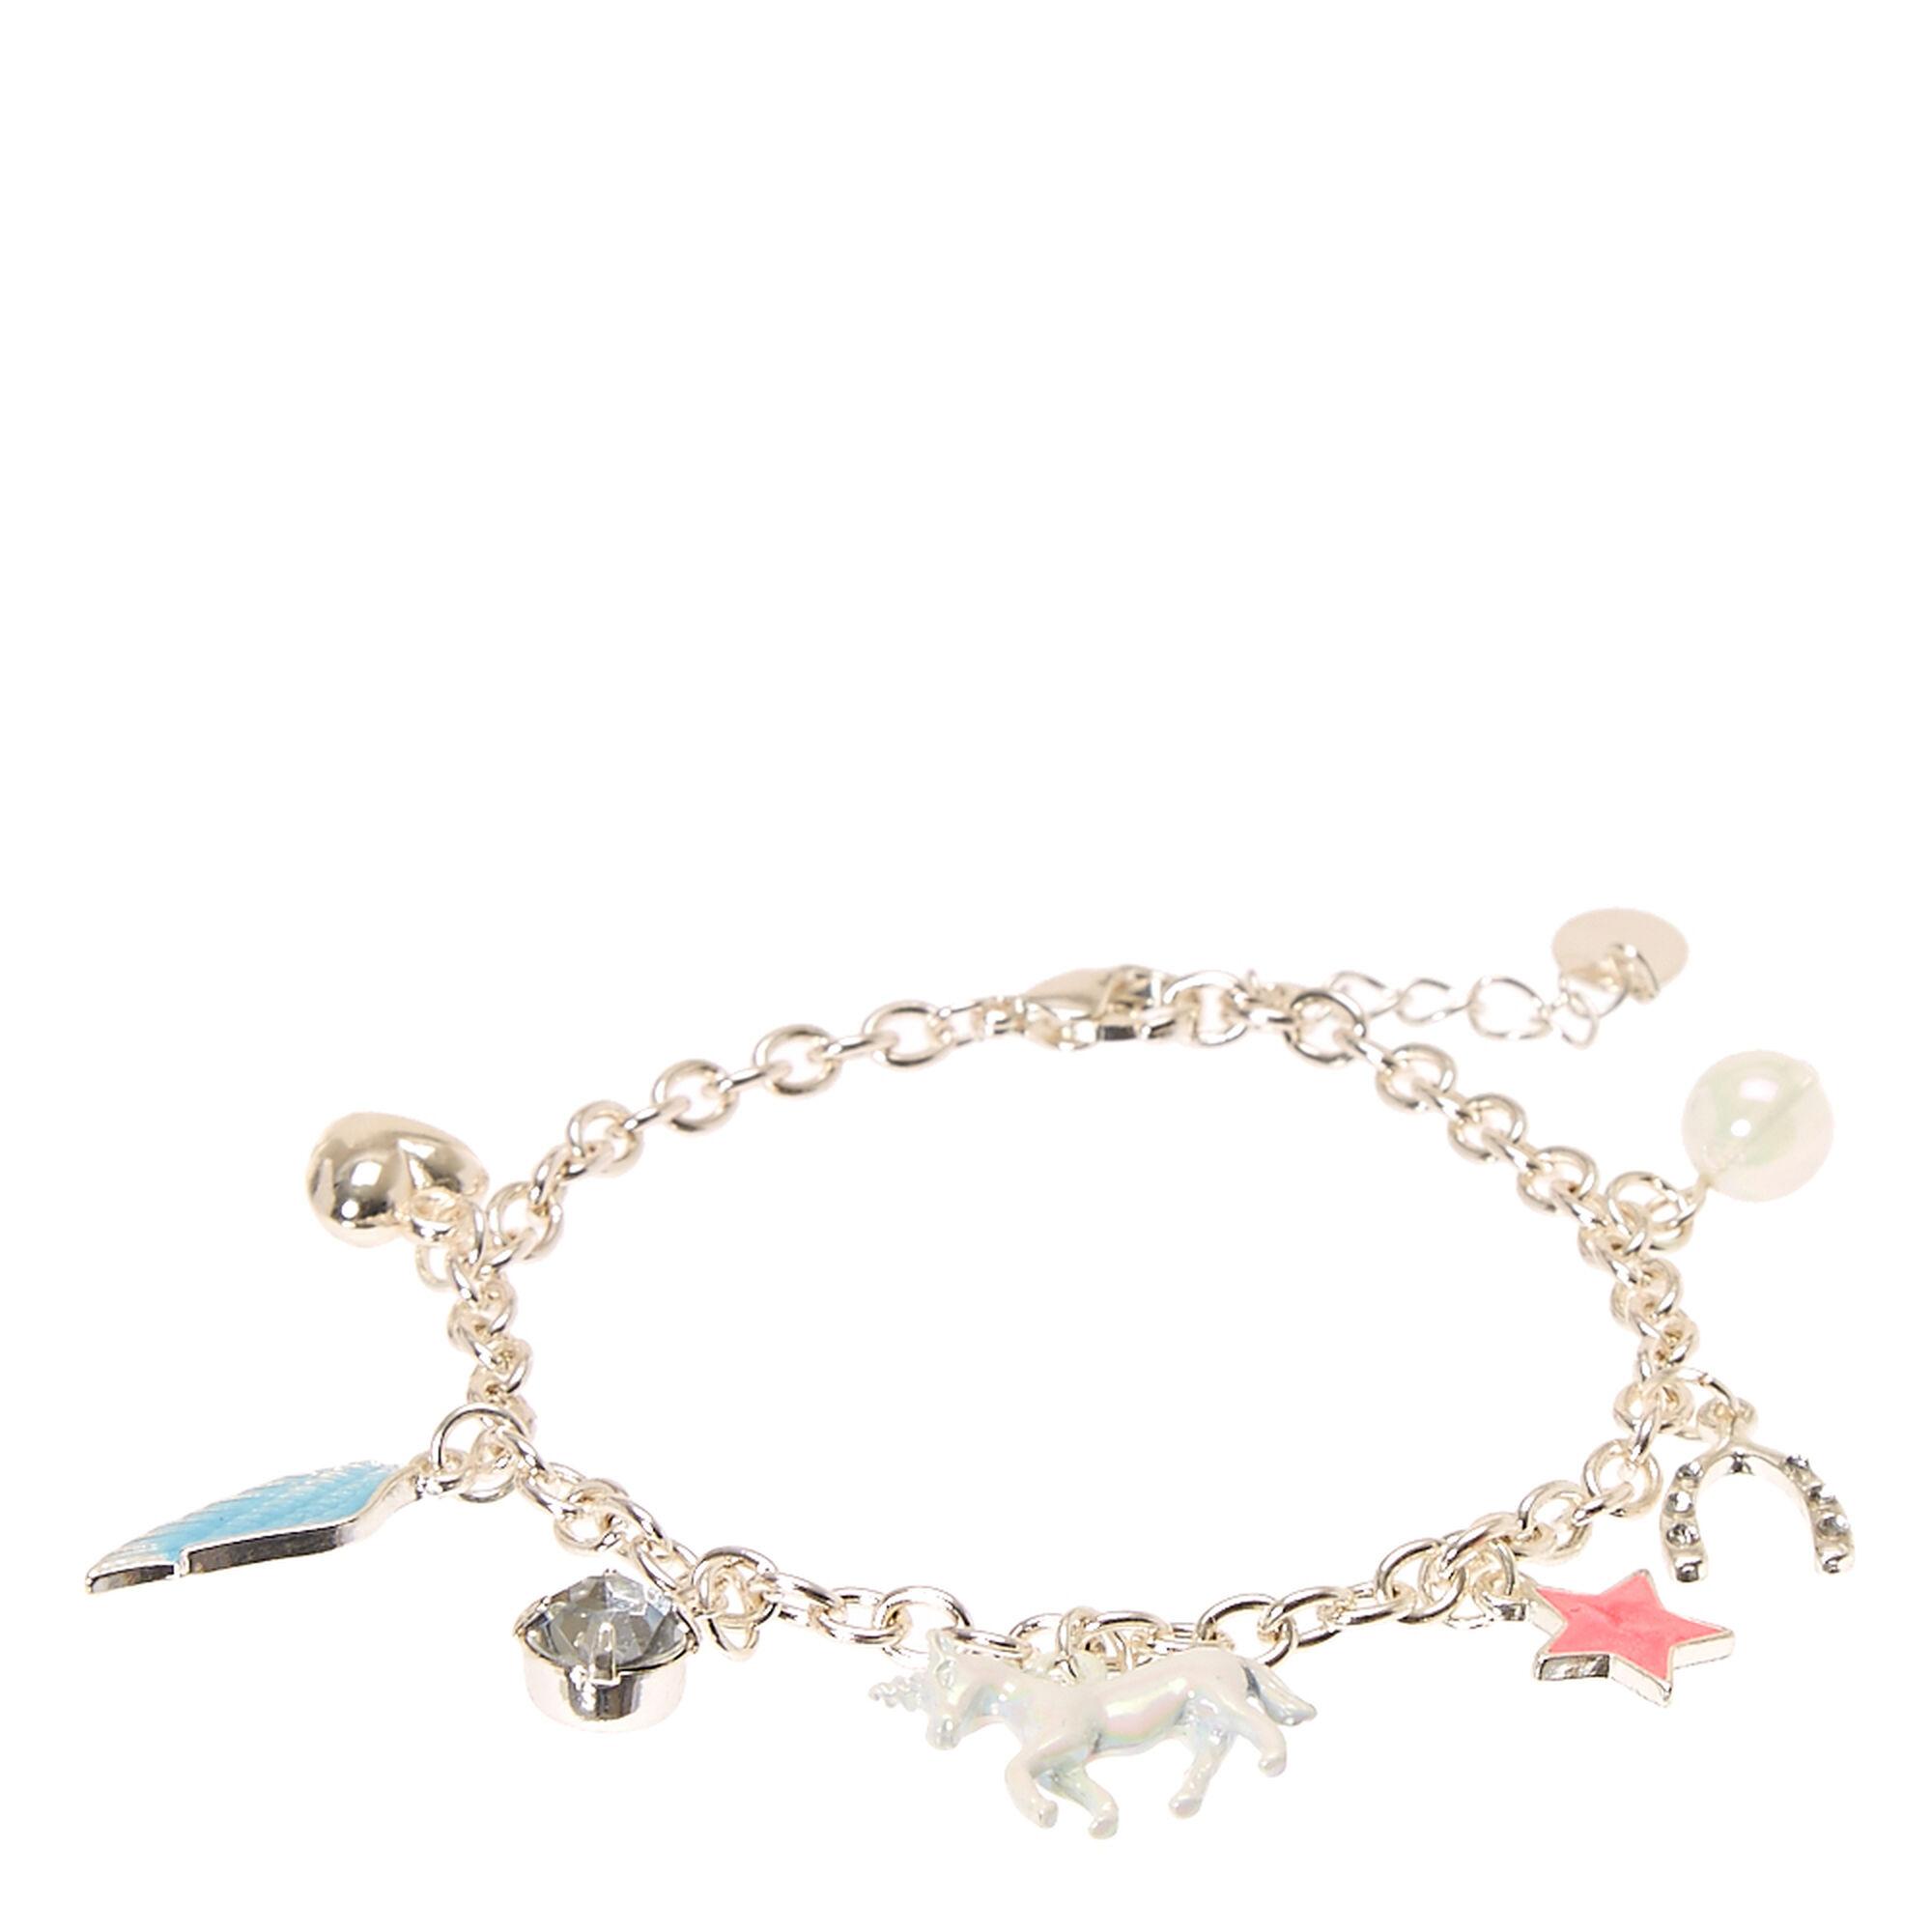 Unicorn Dream Charm Bracelet